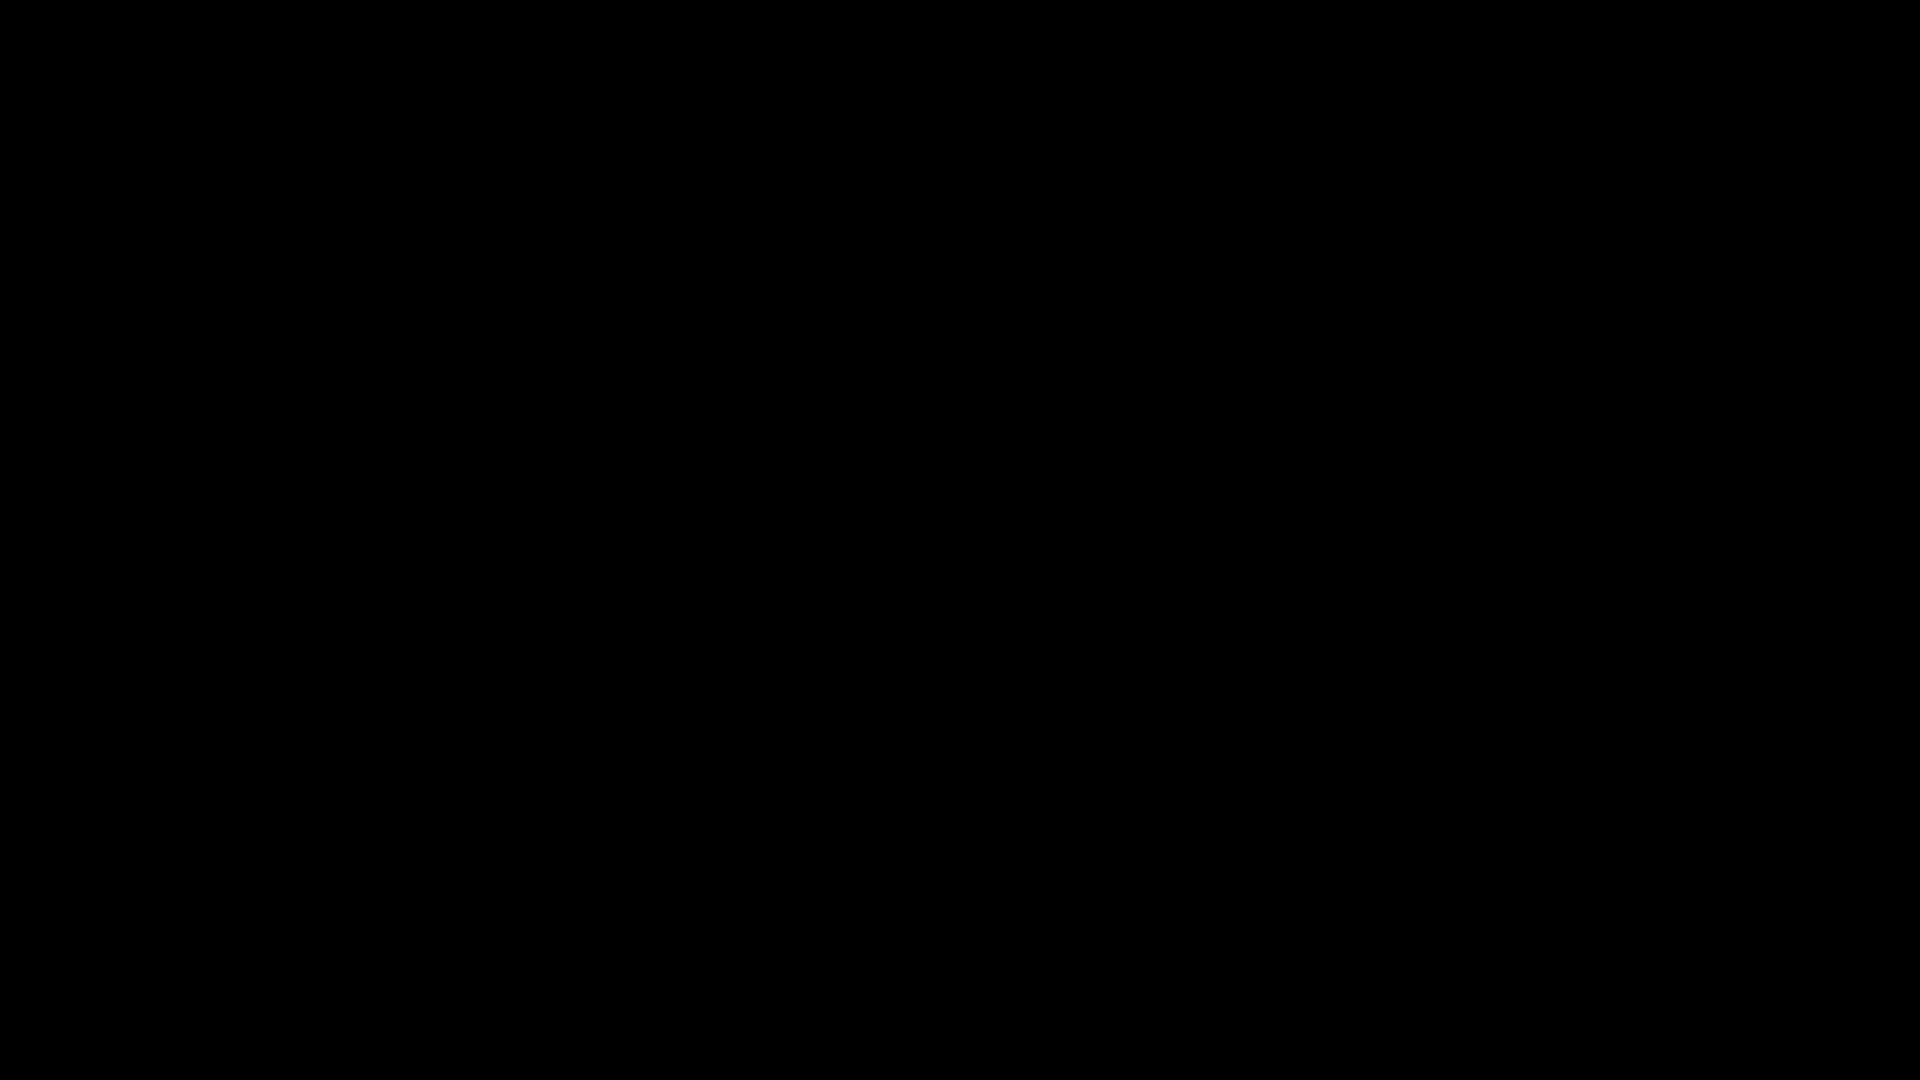 [50+] Solid Black HD Wallpaper on WallpaperSafari